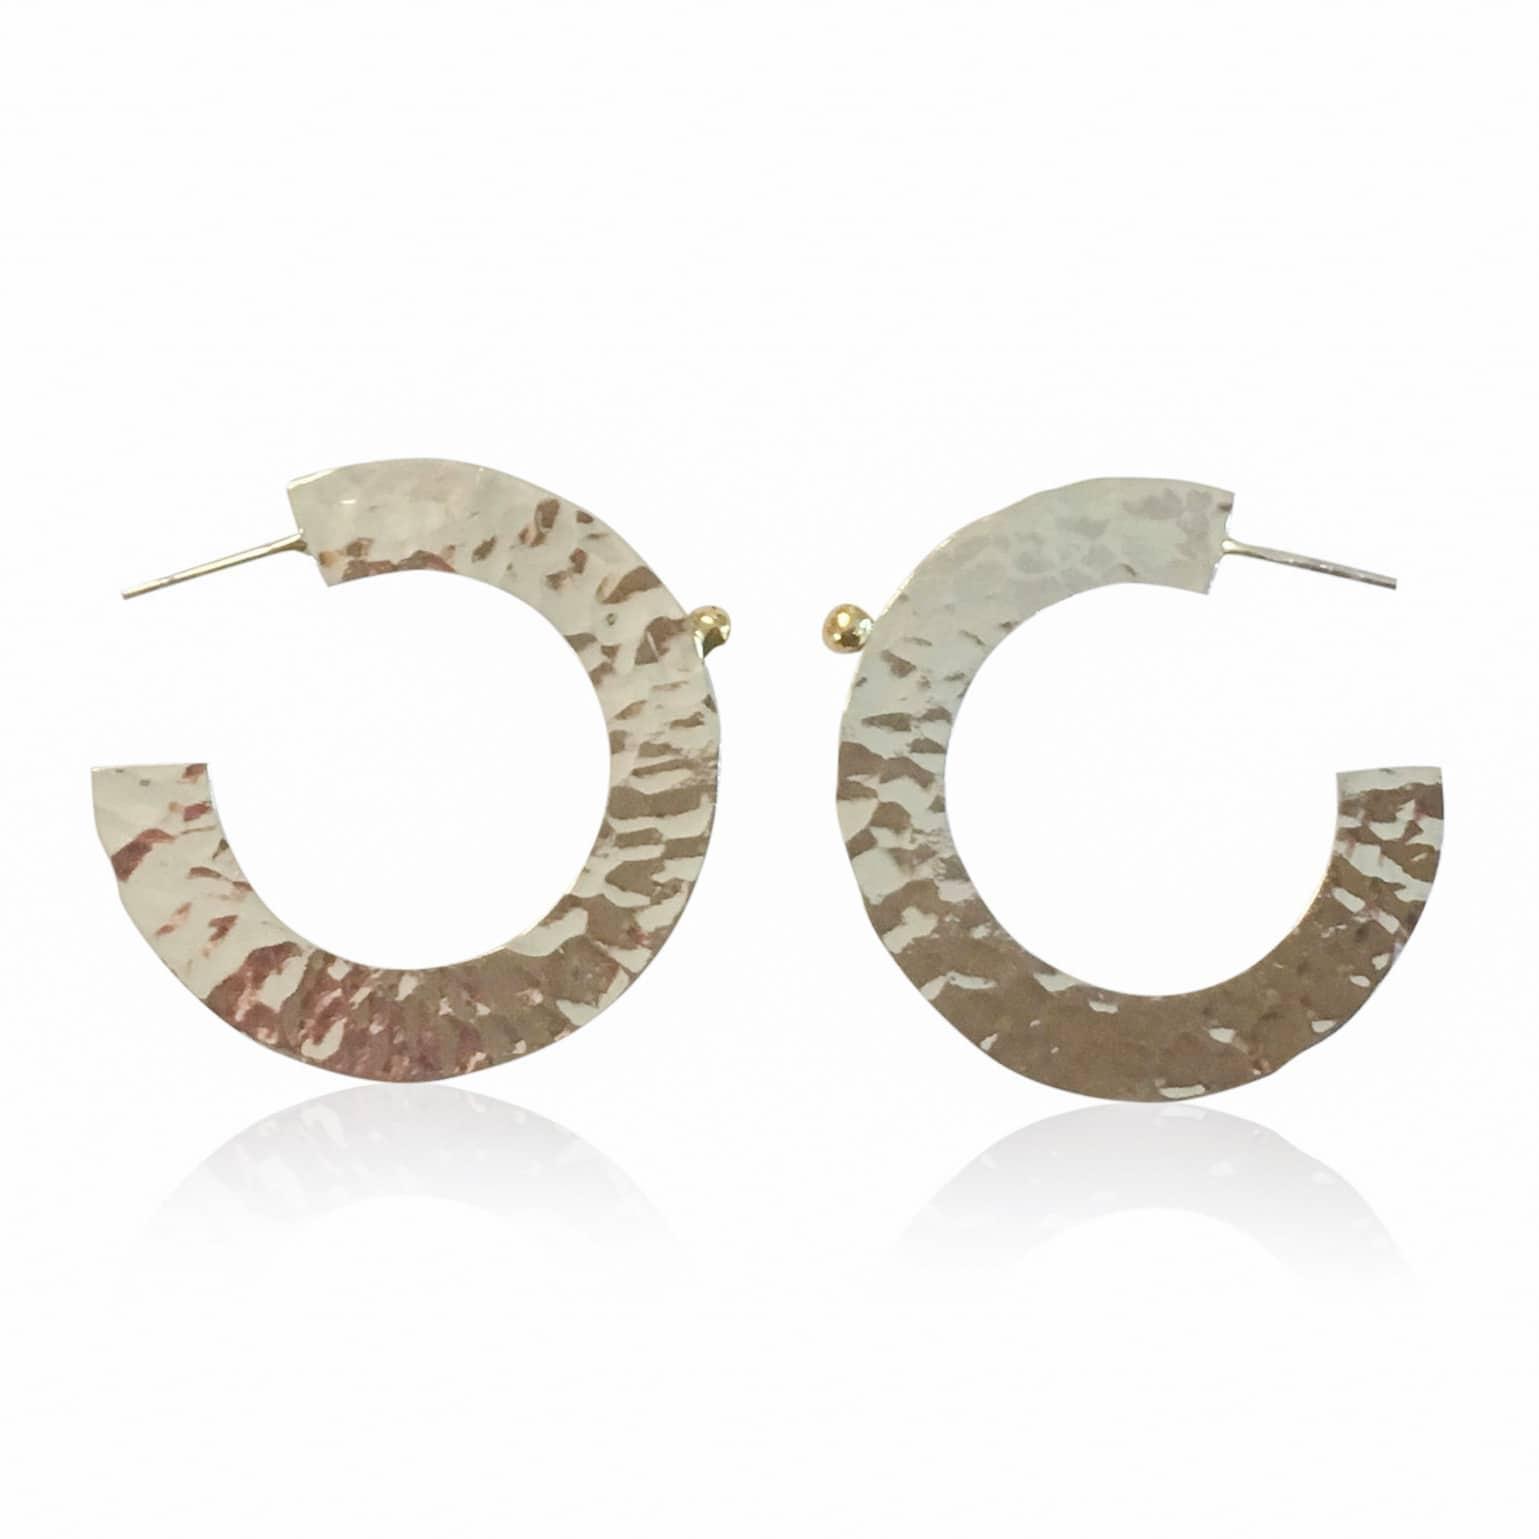 Pernille müller - FRODIG creoler øreringe i sølv med guldklump i 24 karat guld. Frodig crele earrings in silver.